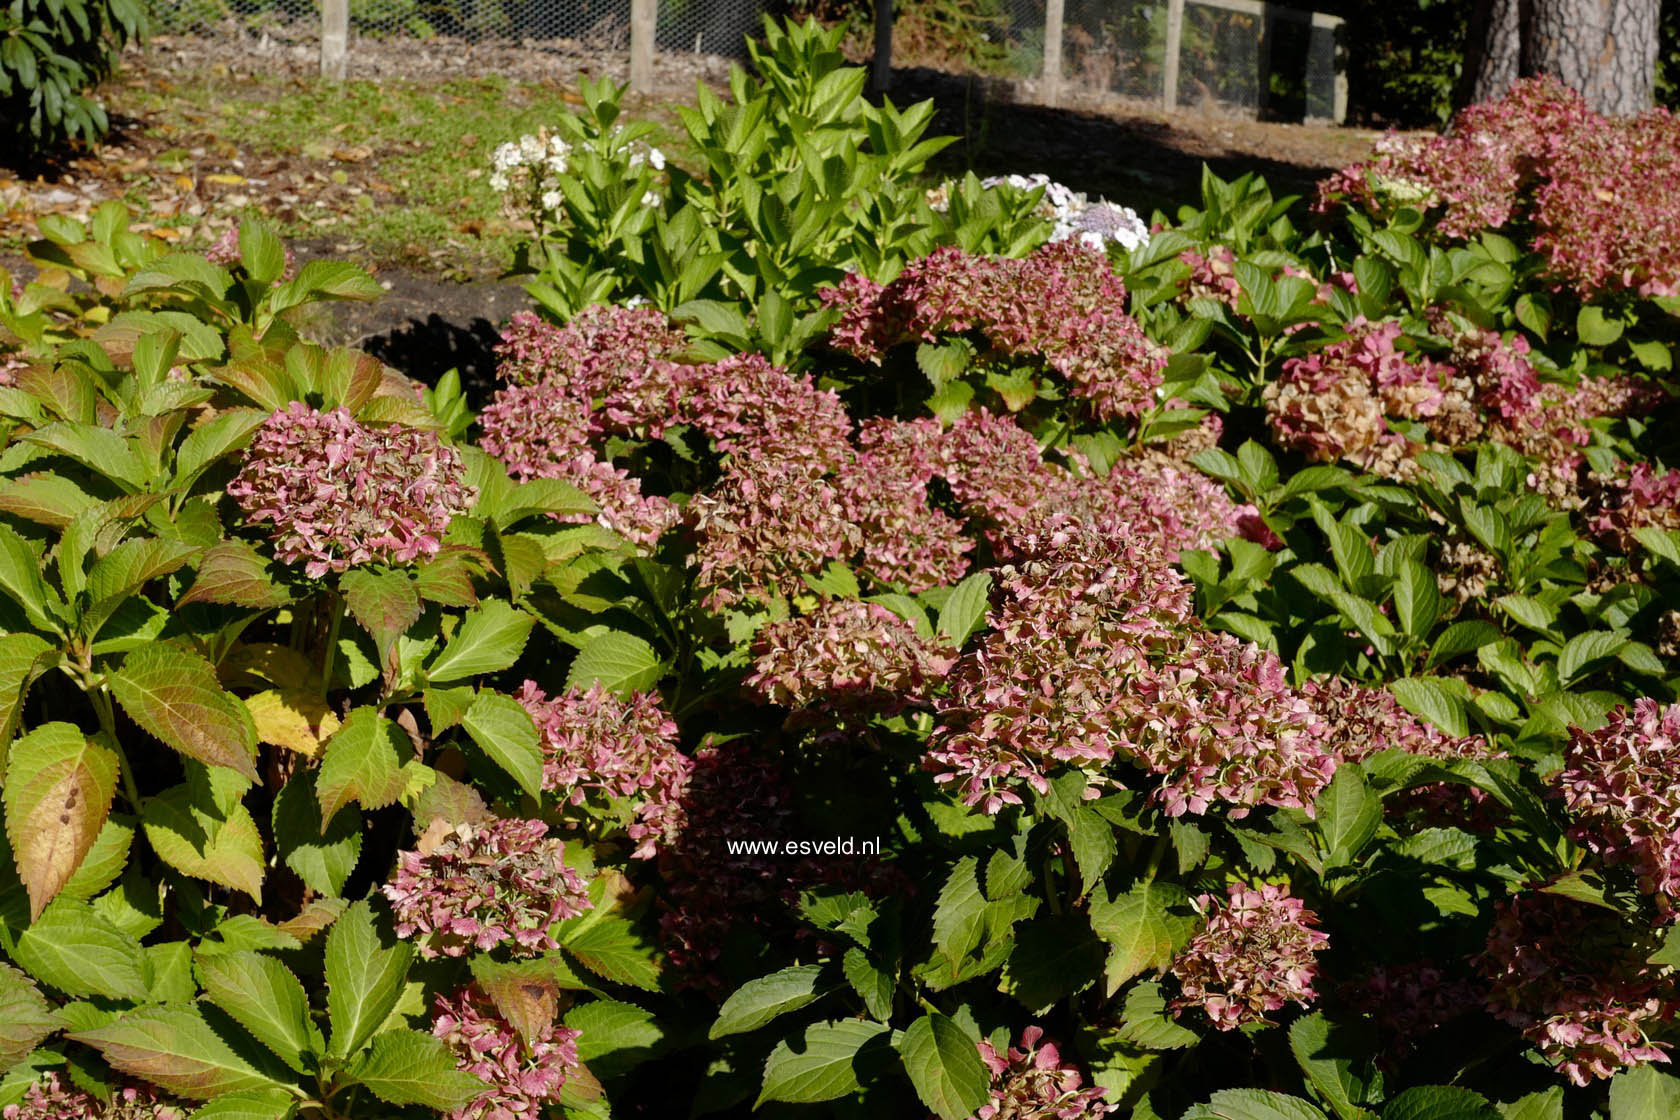 Hydrangea macrophylla 'Nymphe' ('Pax')